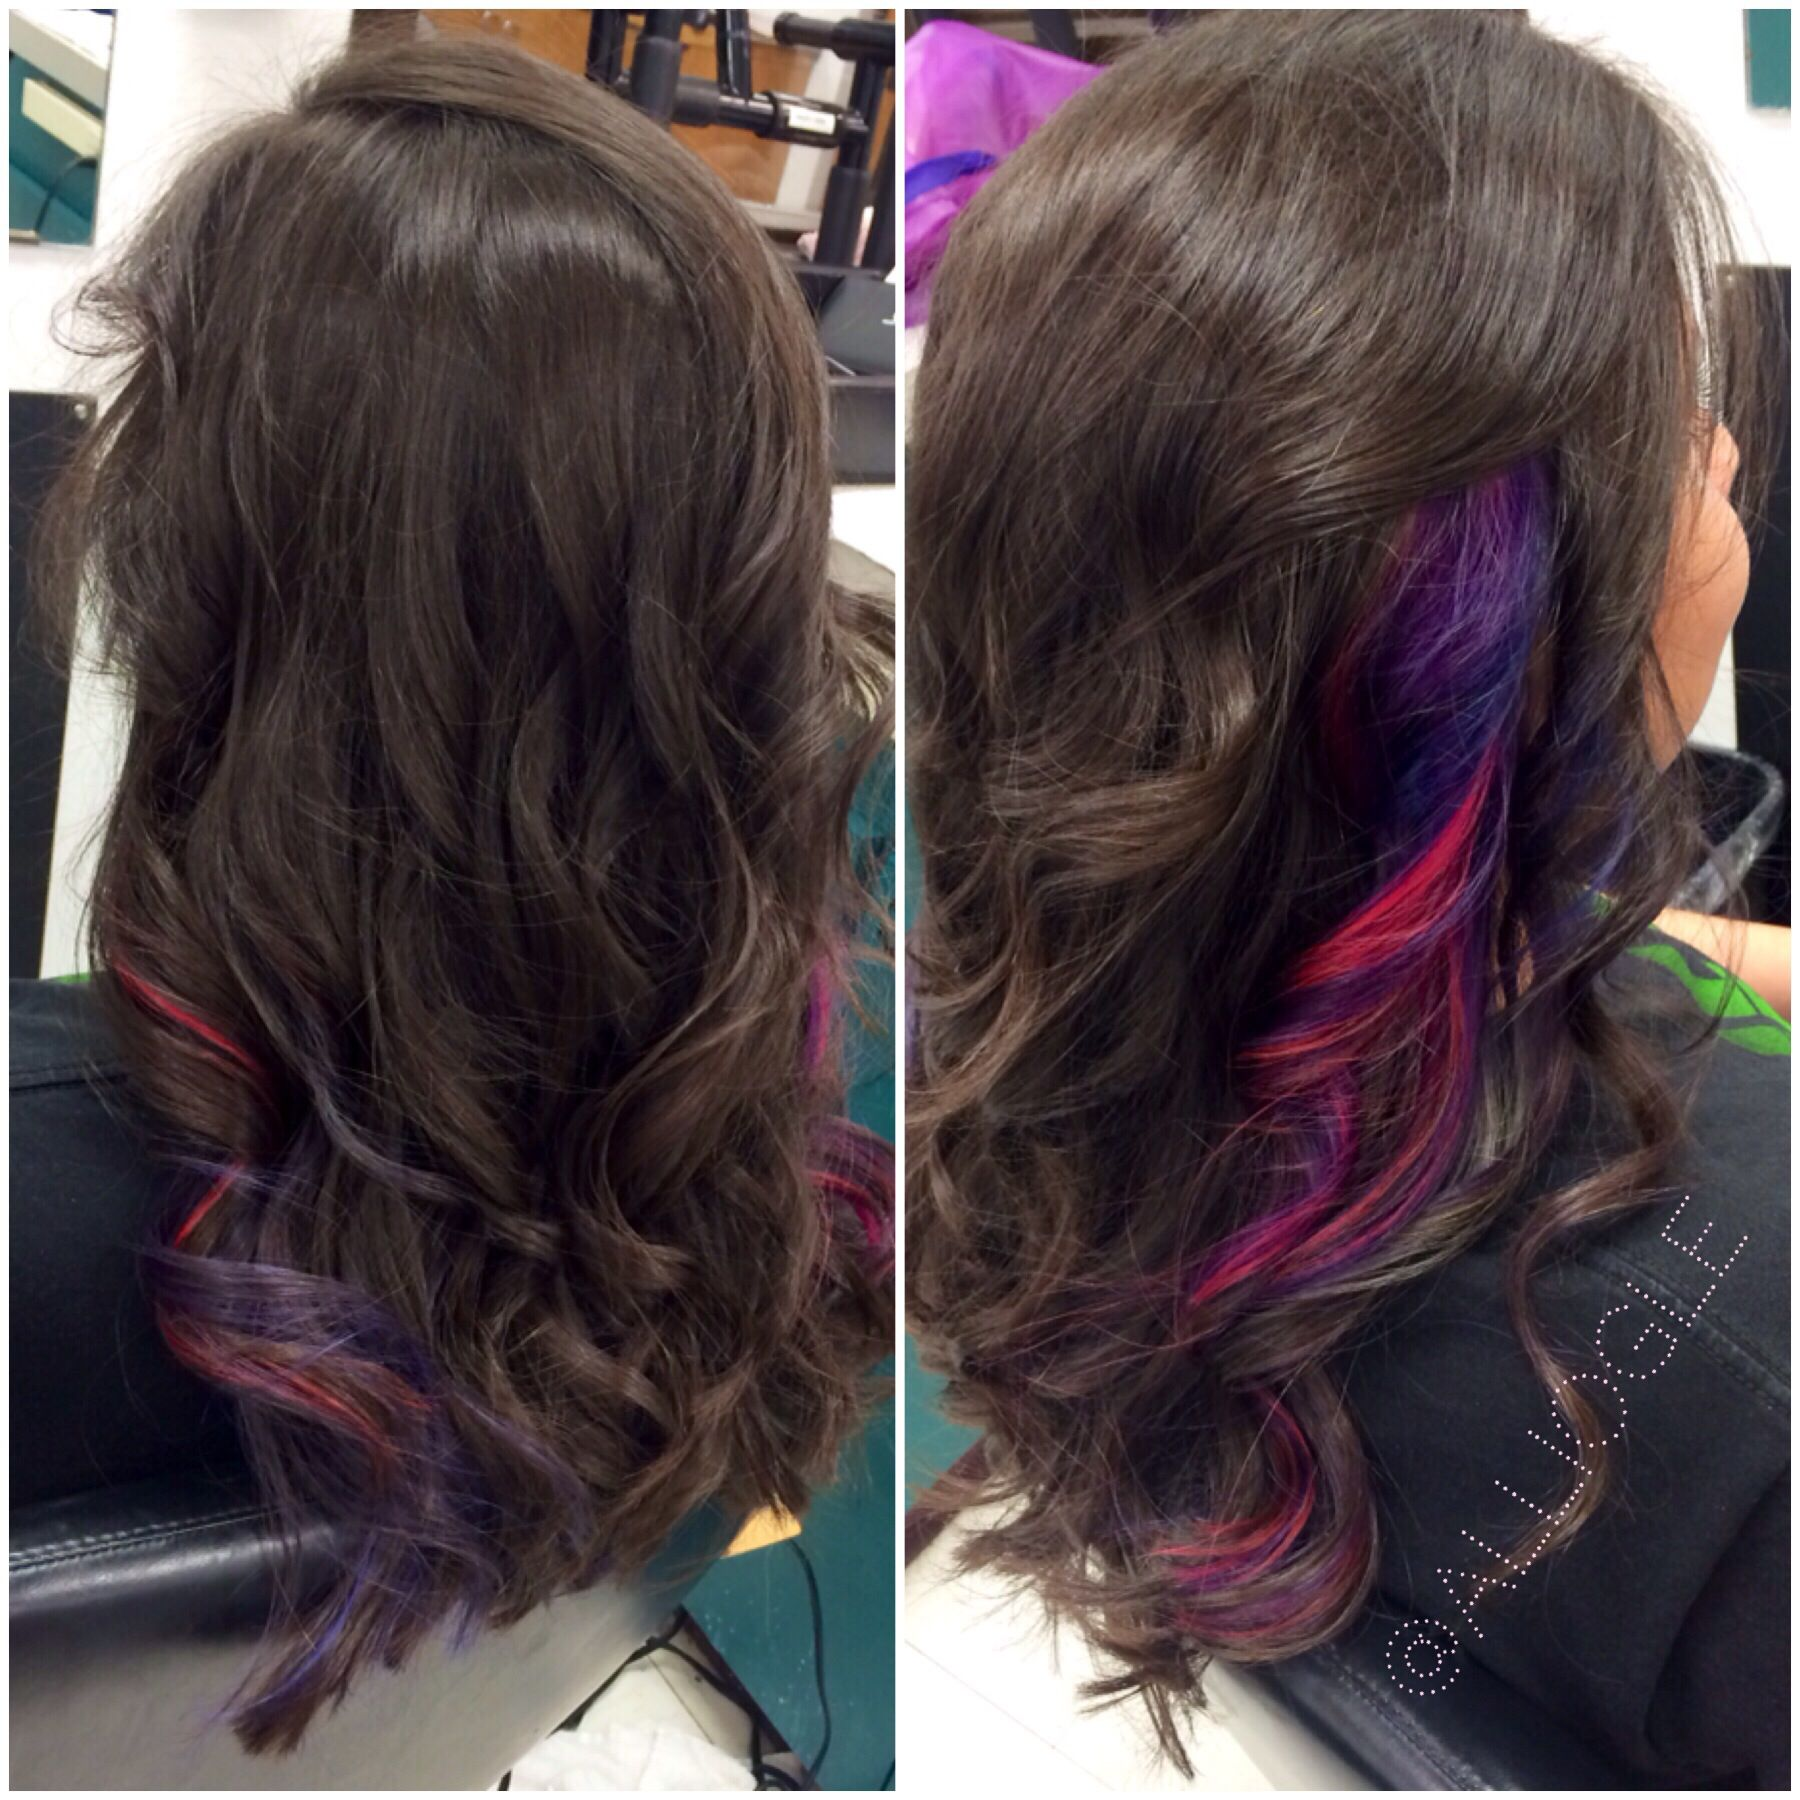 Hair Pink blue violet purple peekaboos H A I R Z ✂